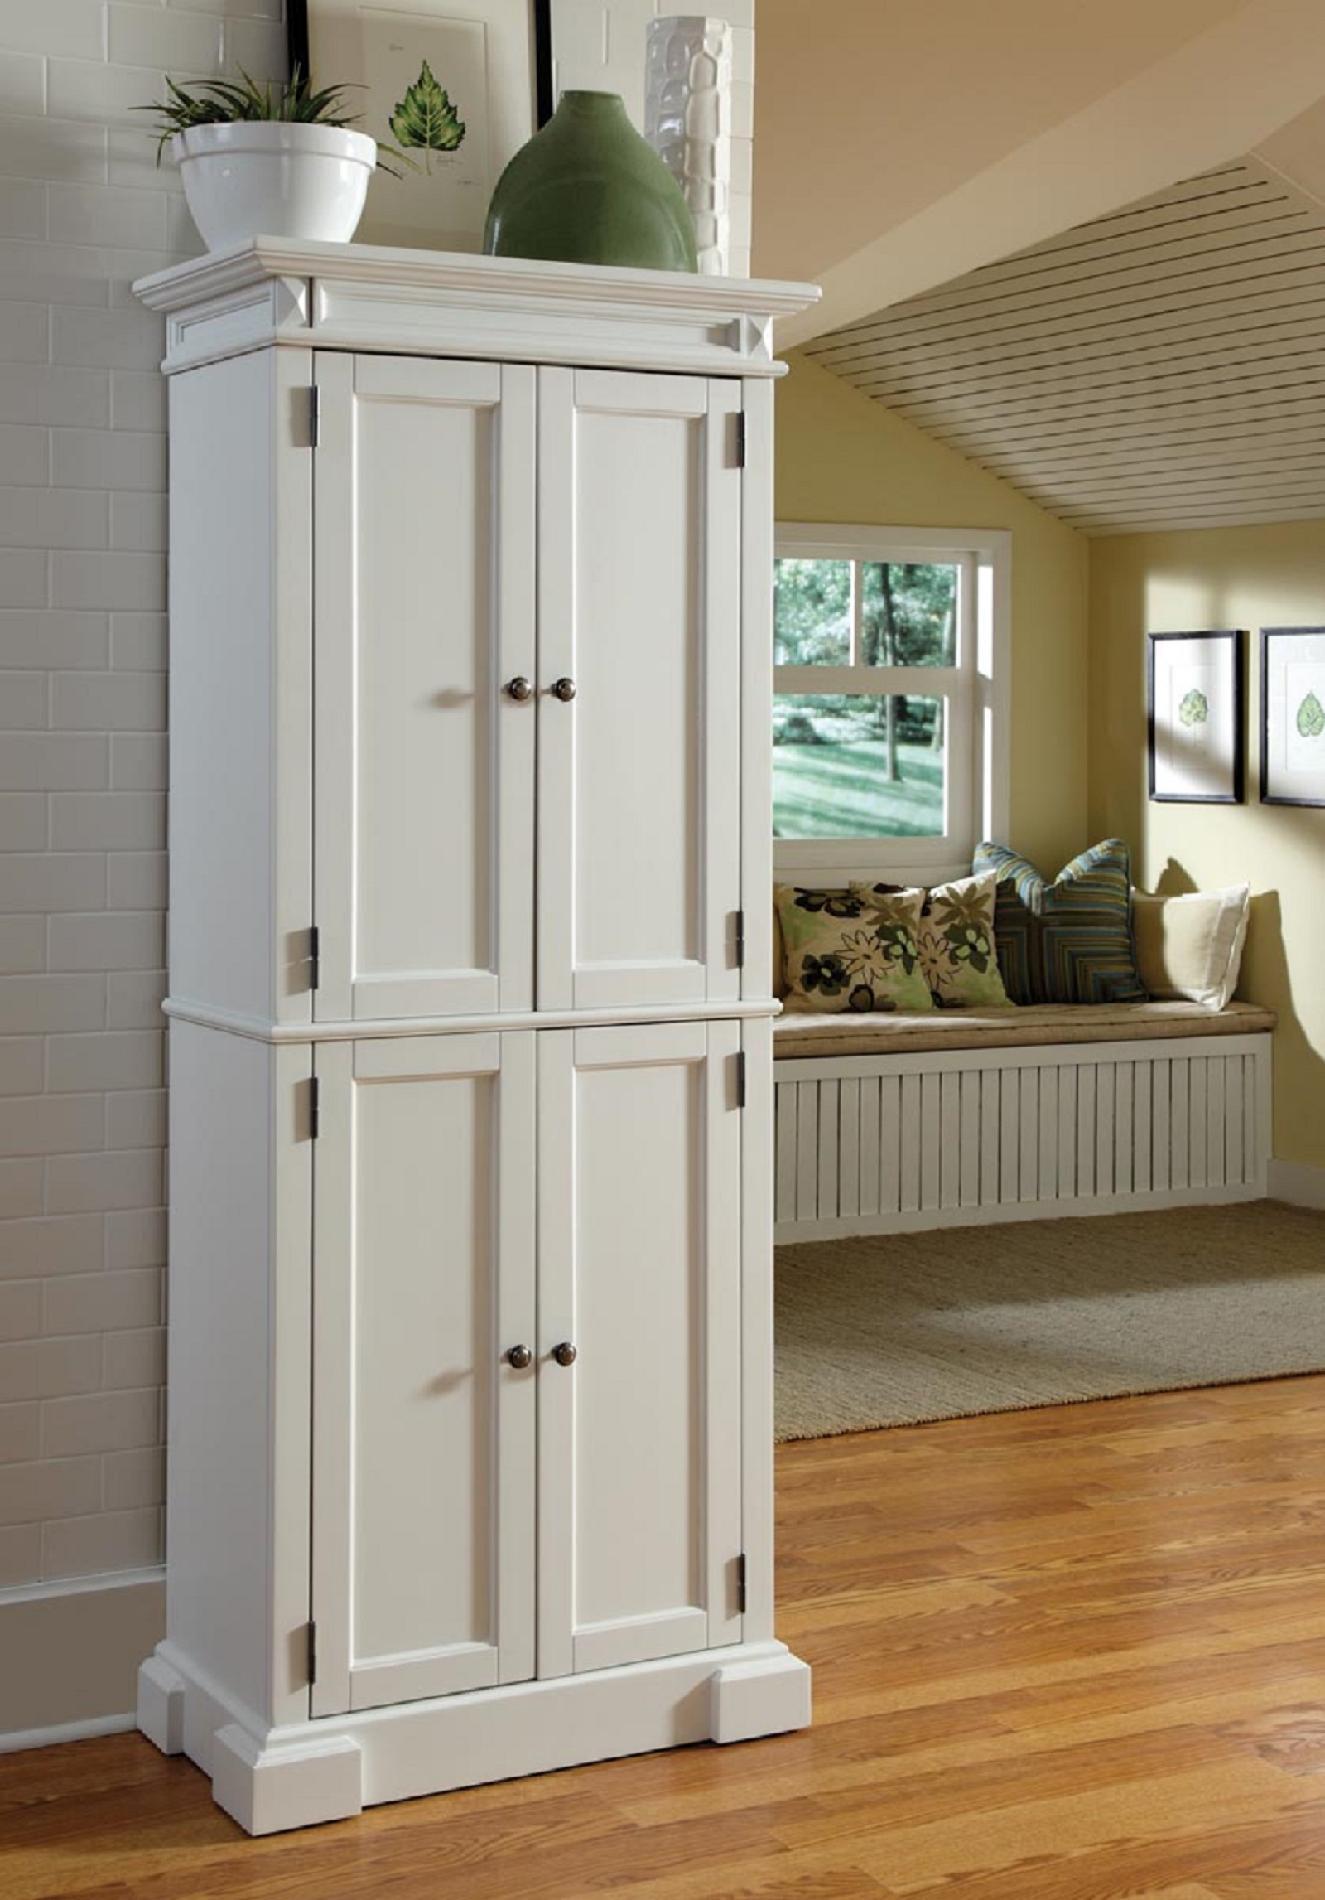 Home Styles 5004 692 Americana Pantry Storage Cabinet, White Finish